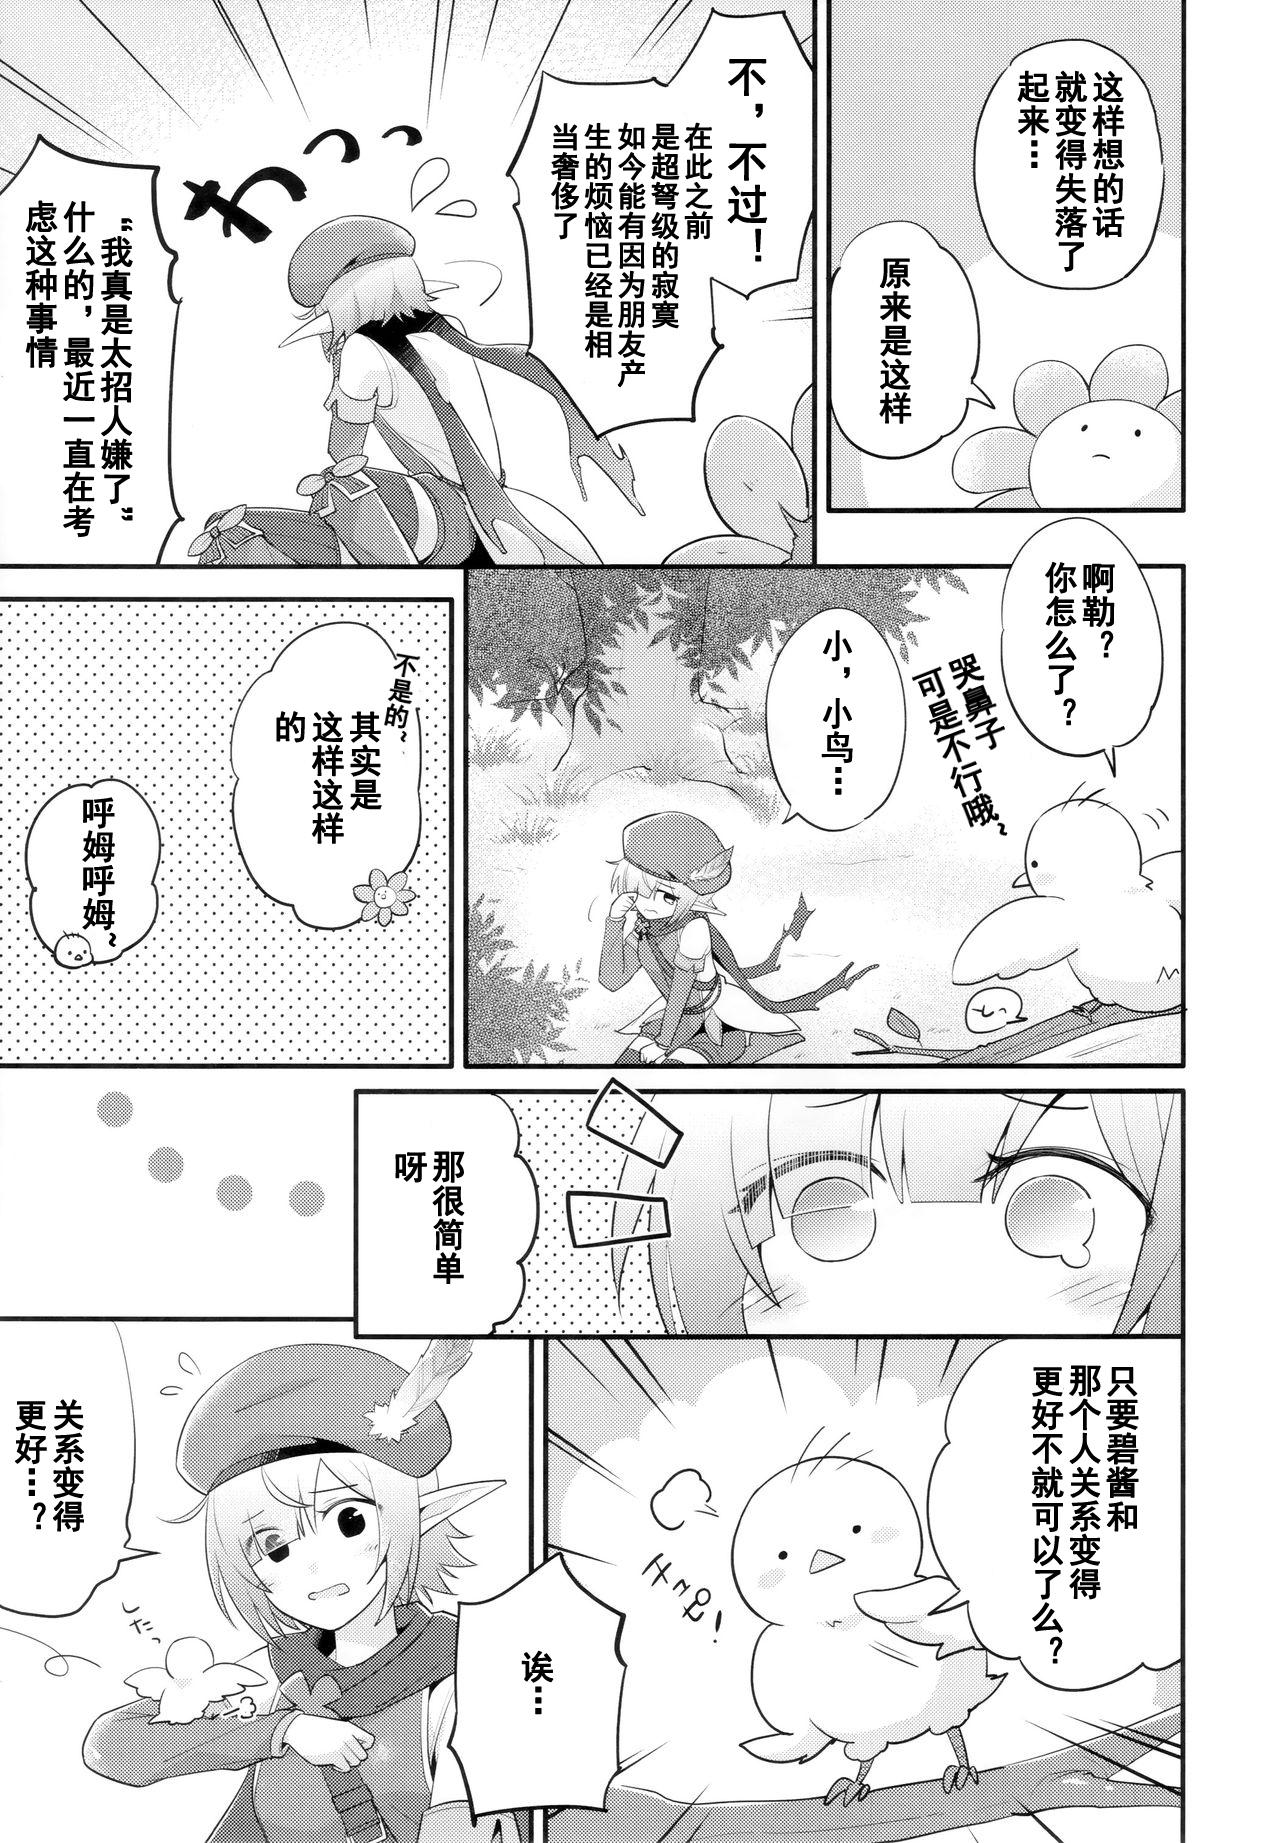 Aoi no Motto Otomodachi Daisakusen 6